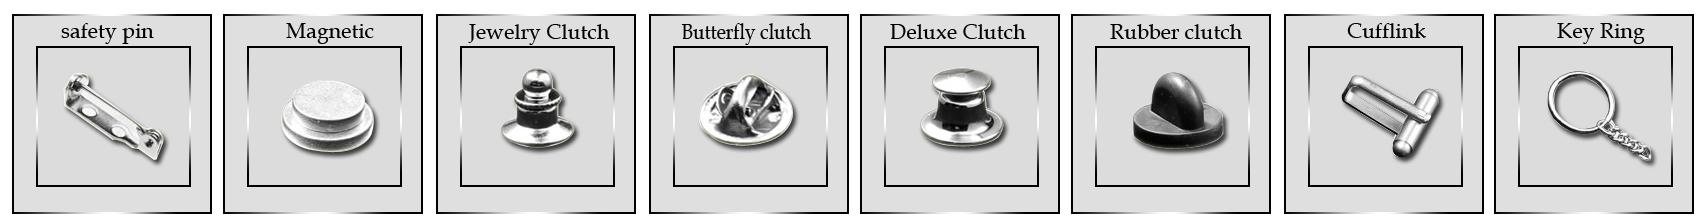 custom metal cartoon hard enamel lapel pin badge No Minimum Order with butterfly clutch